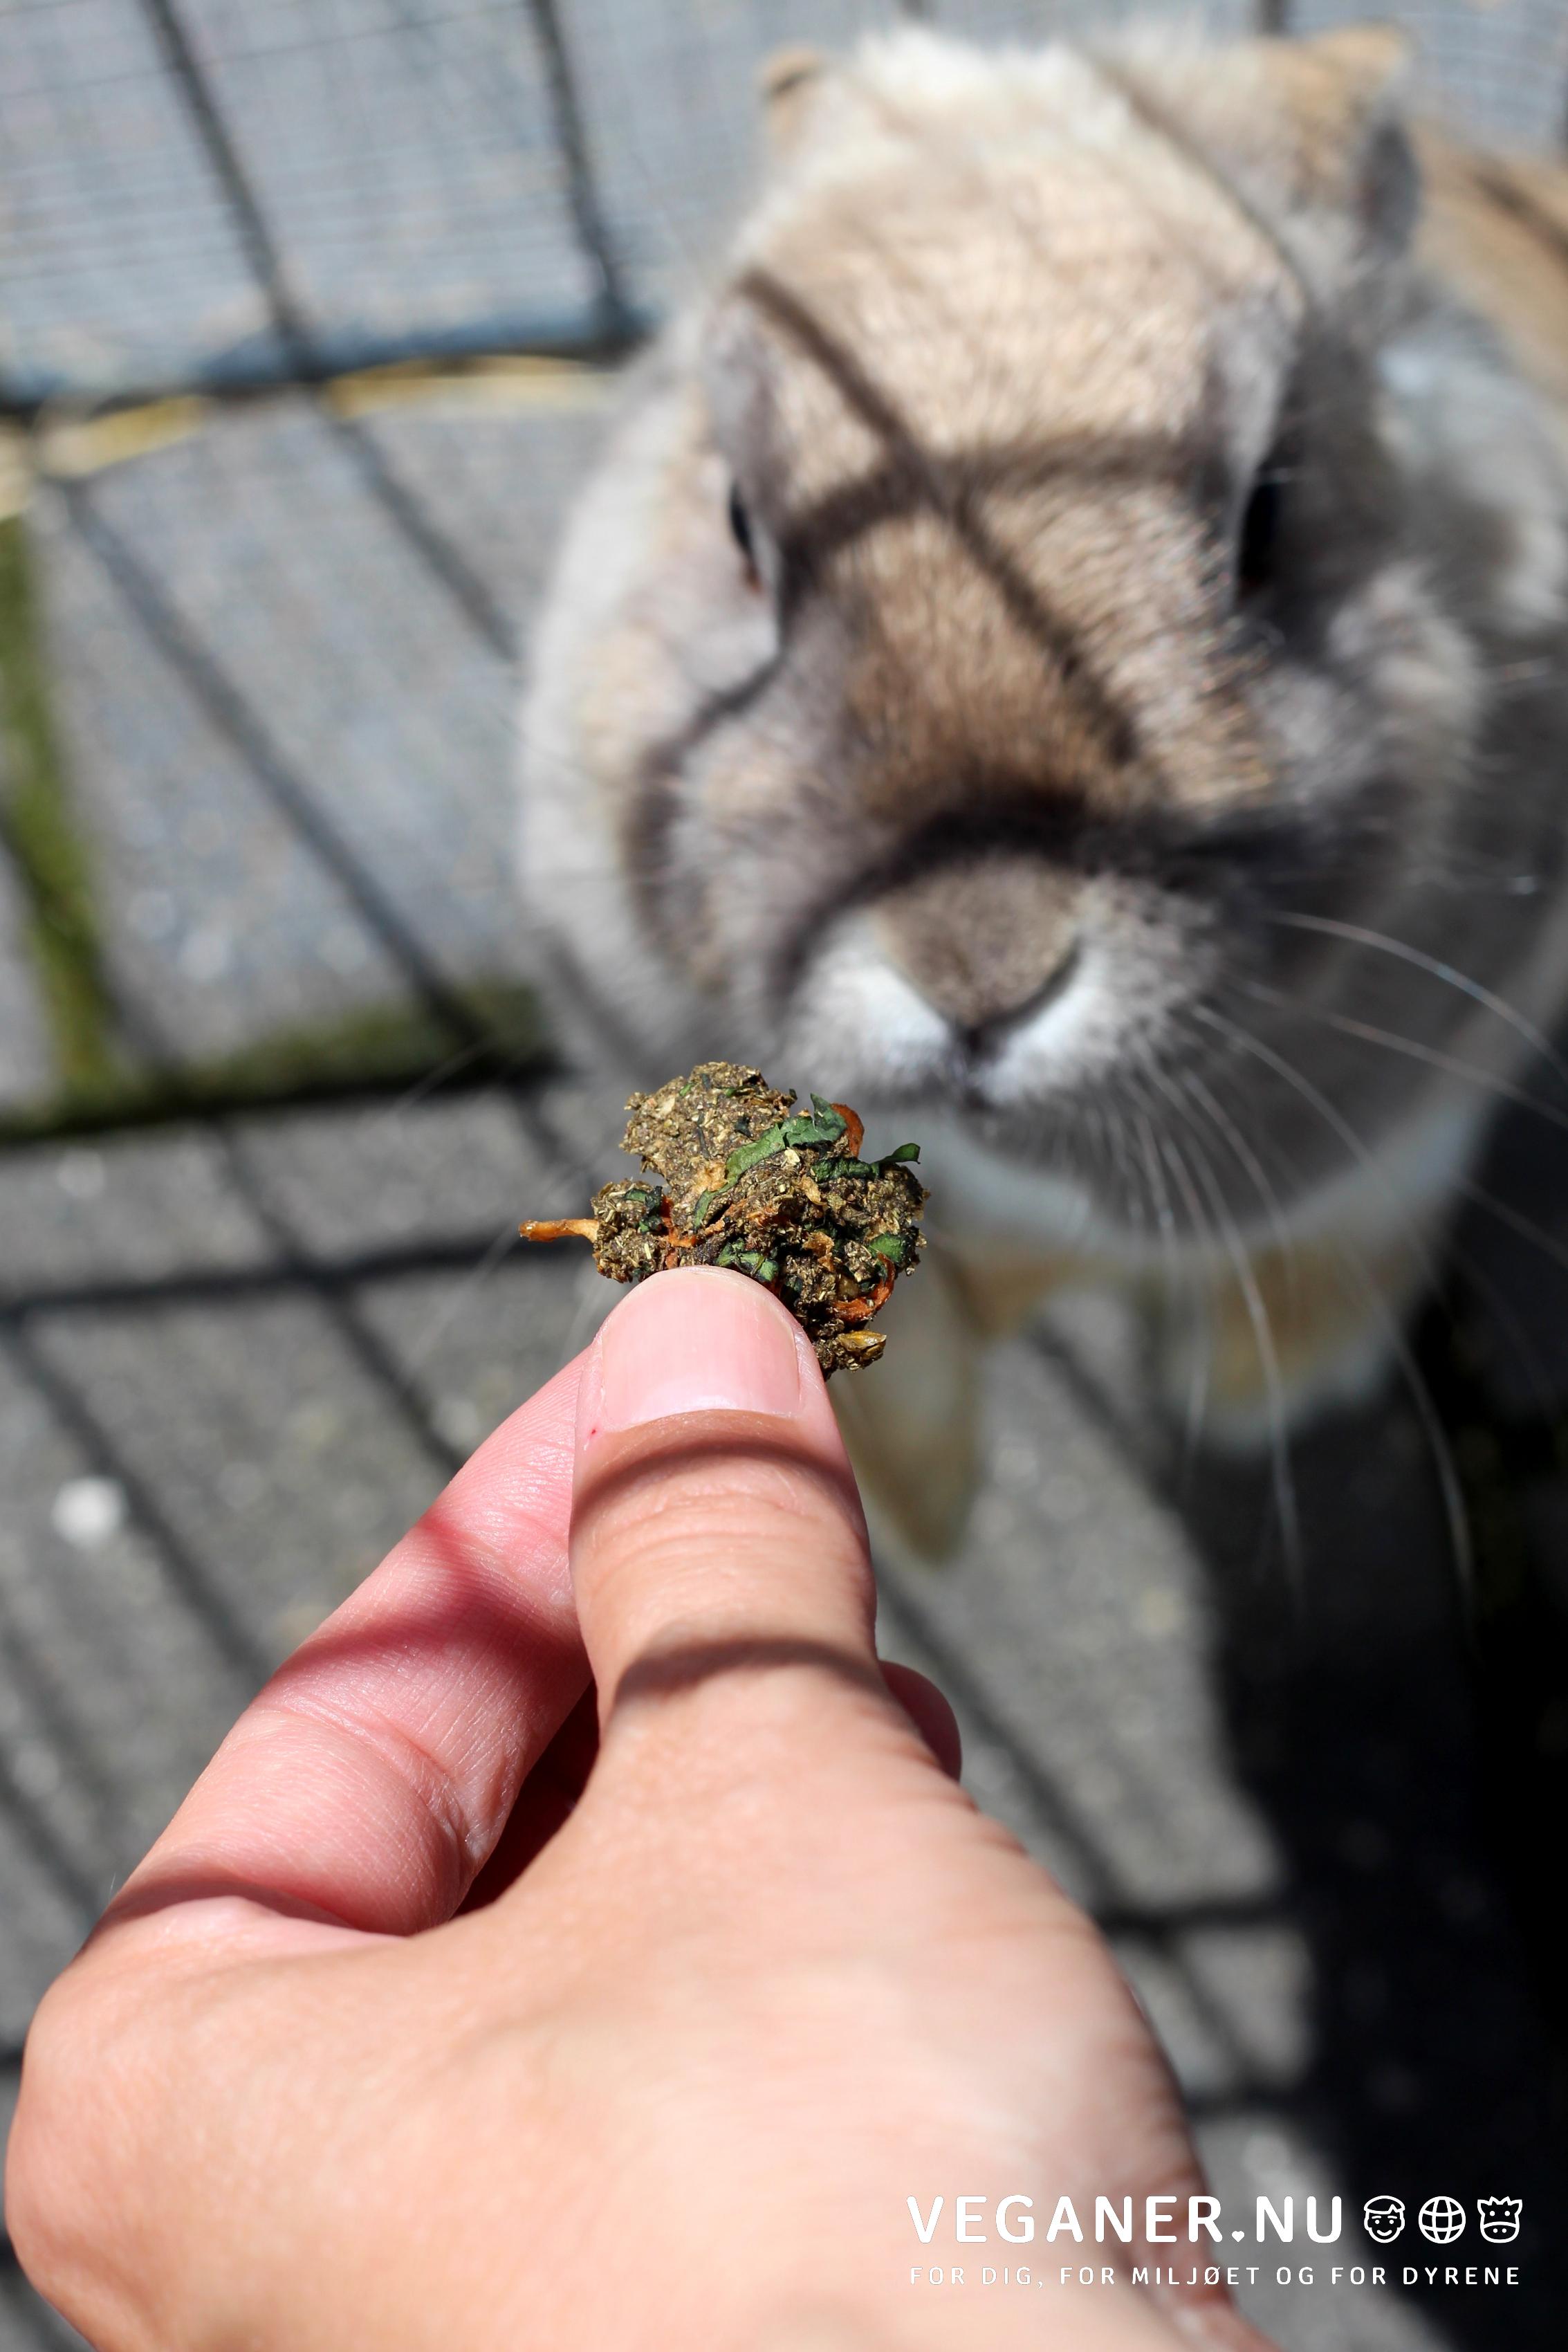 Veganer.nu-kaningodbid-kaninsnack